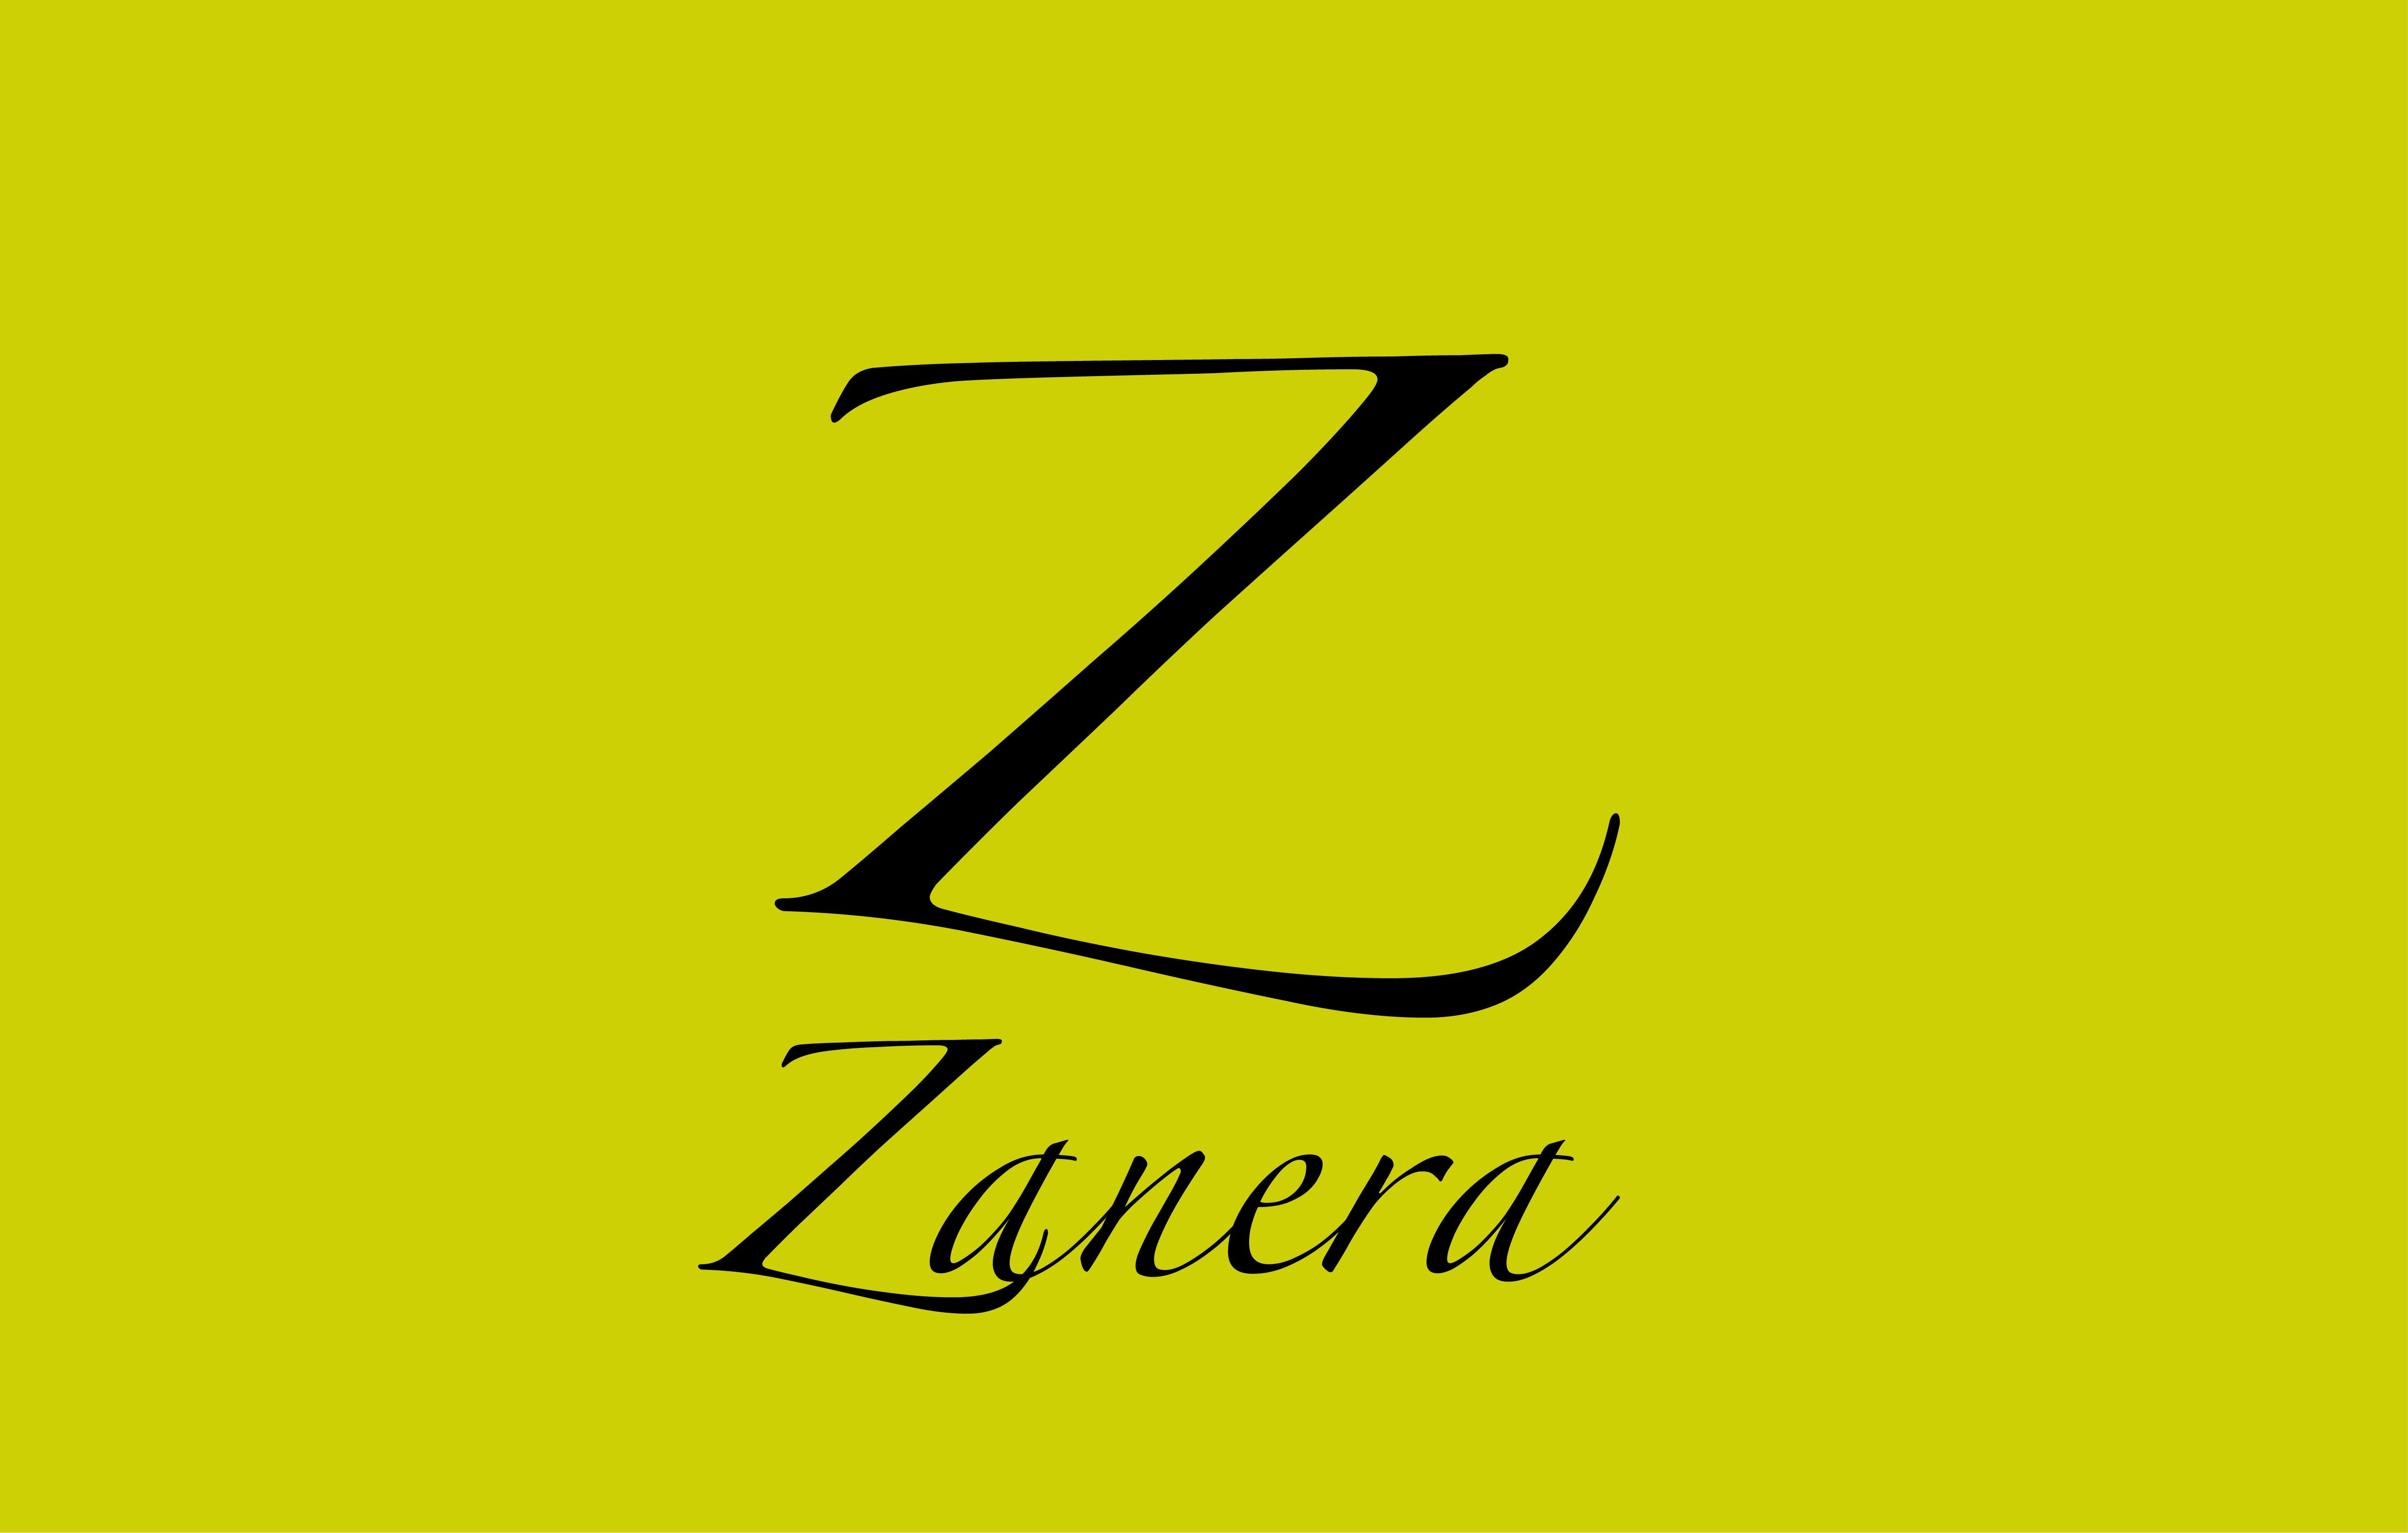 logo Zanera